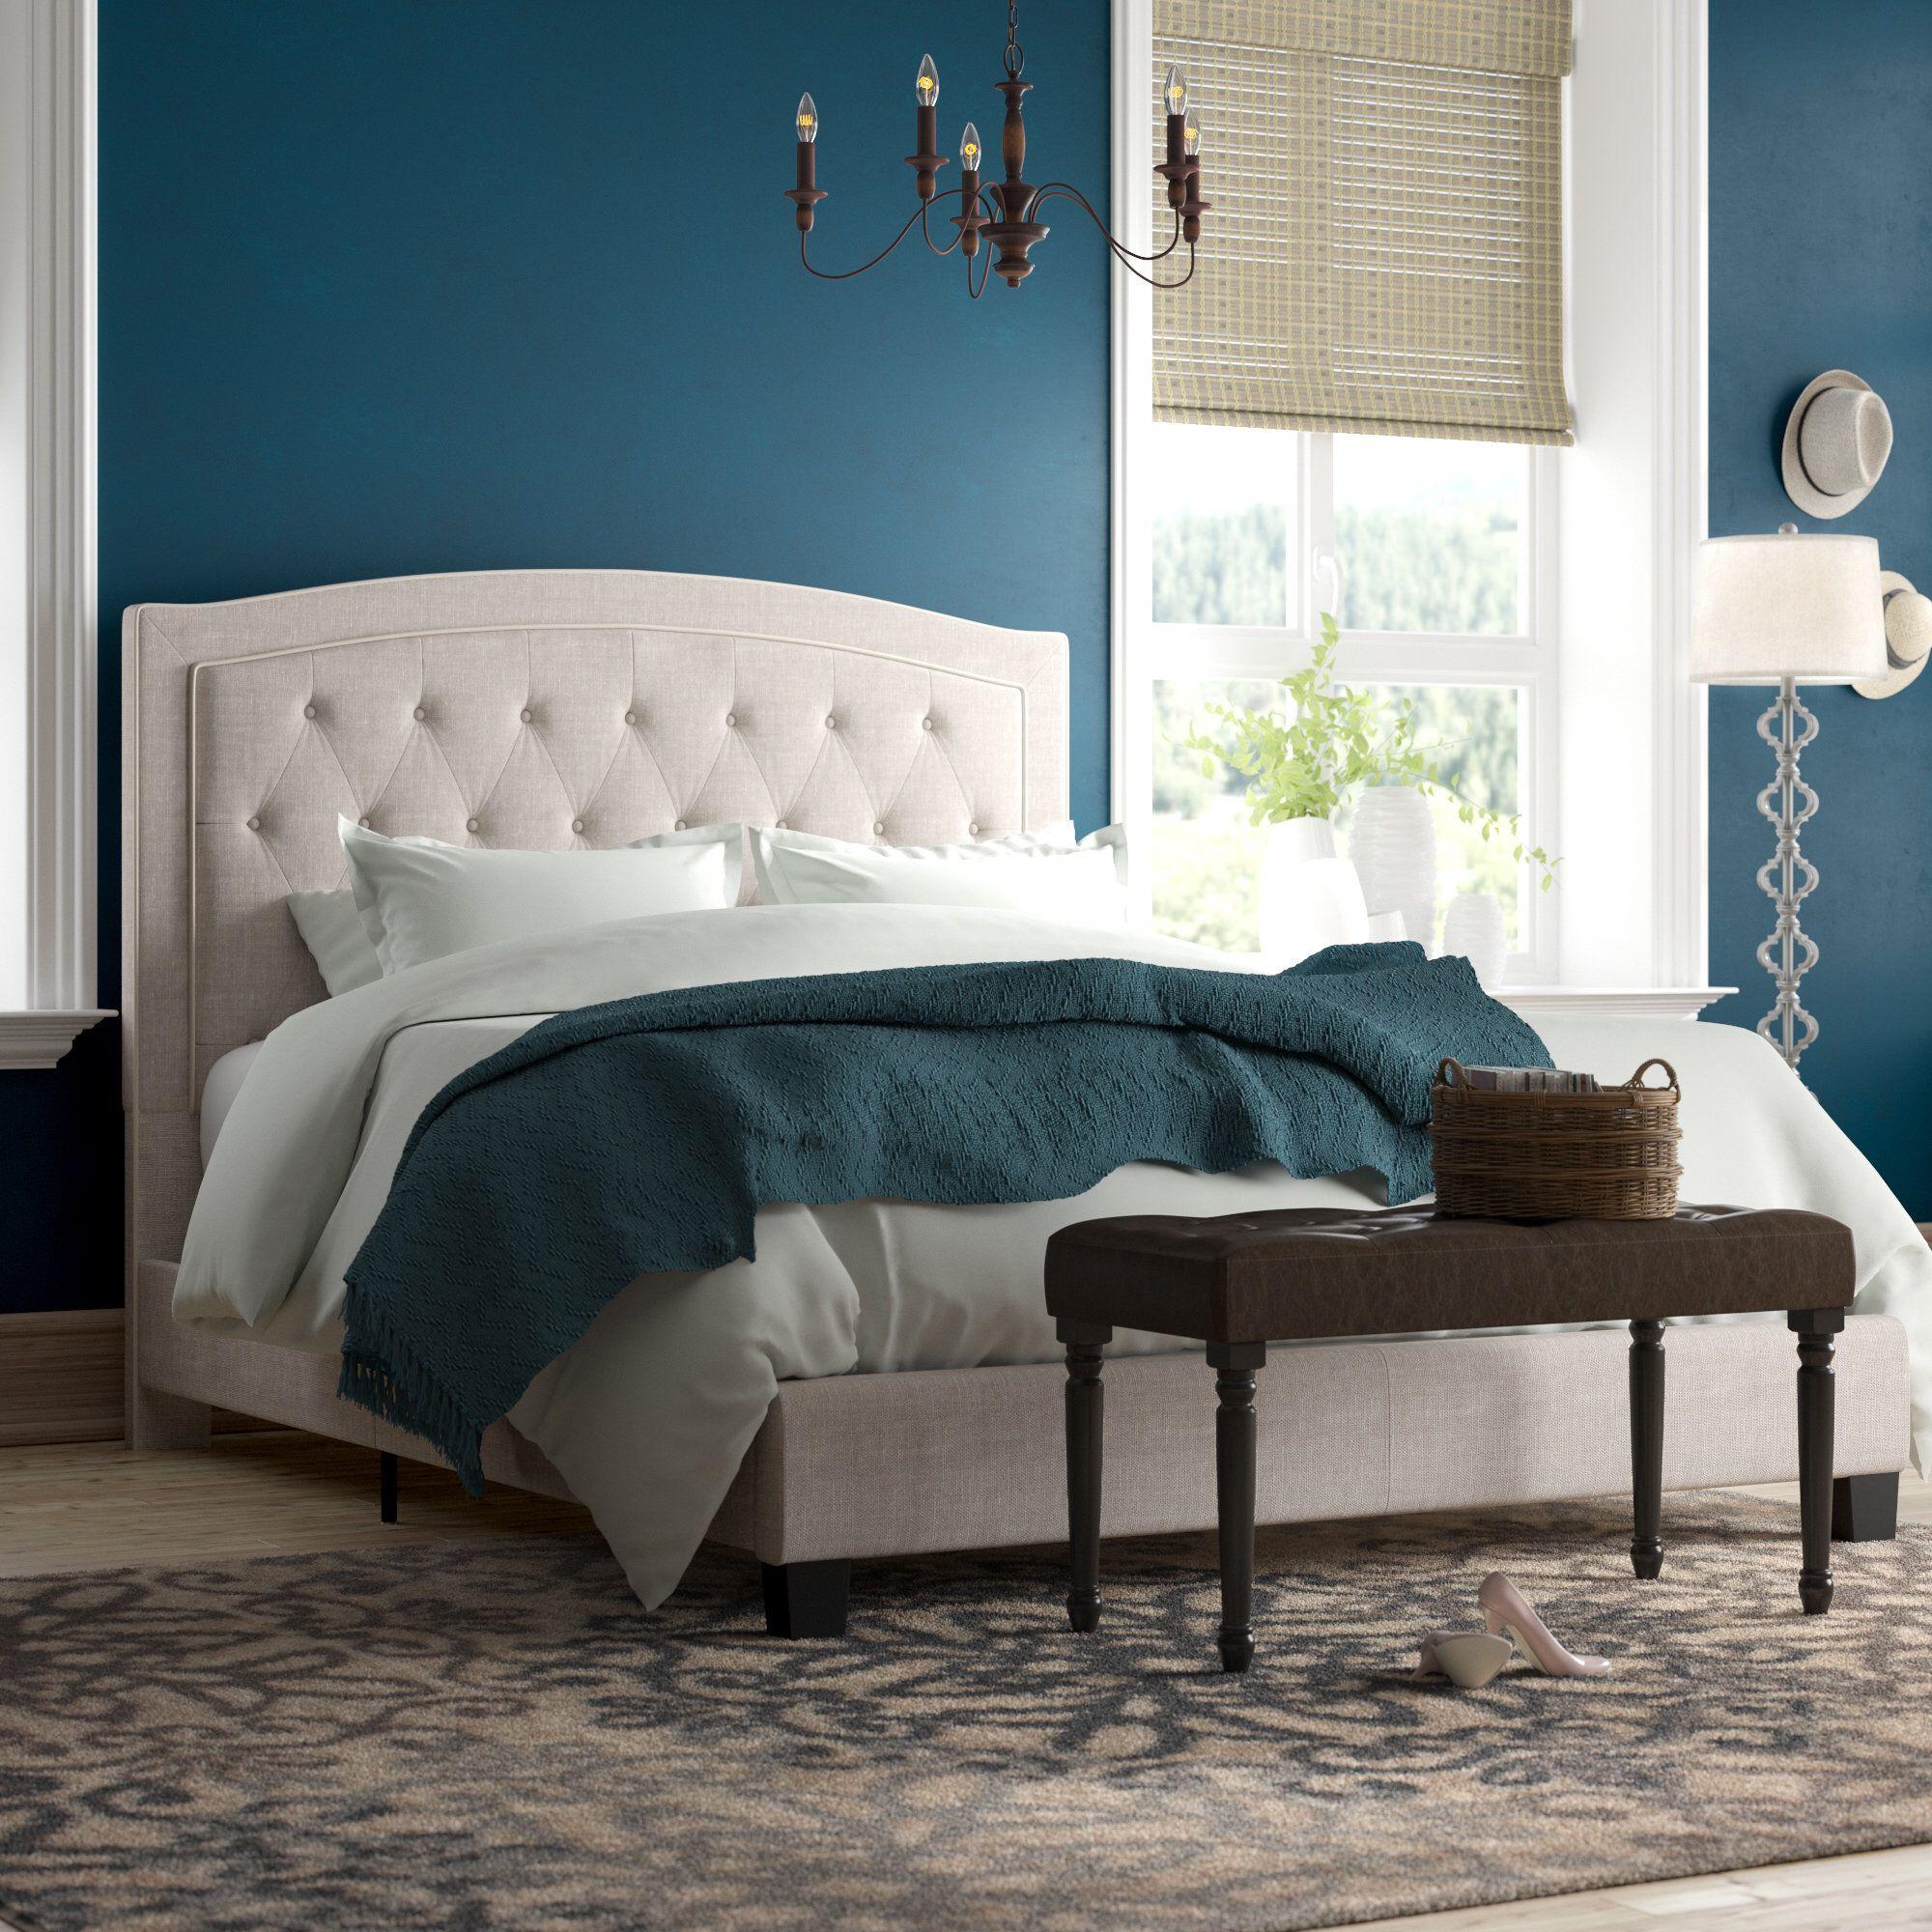 Rockaway Upholstered Panel Bed Upholstered panel bed